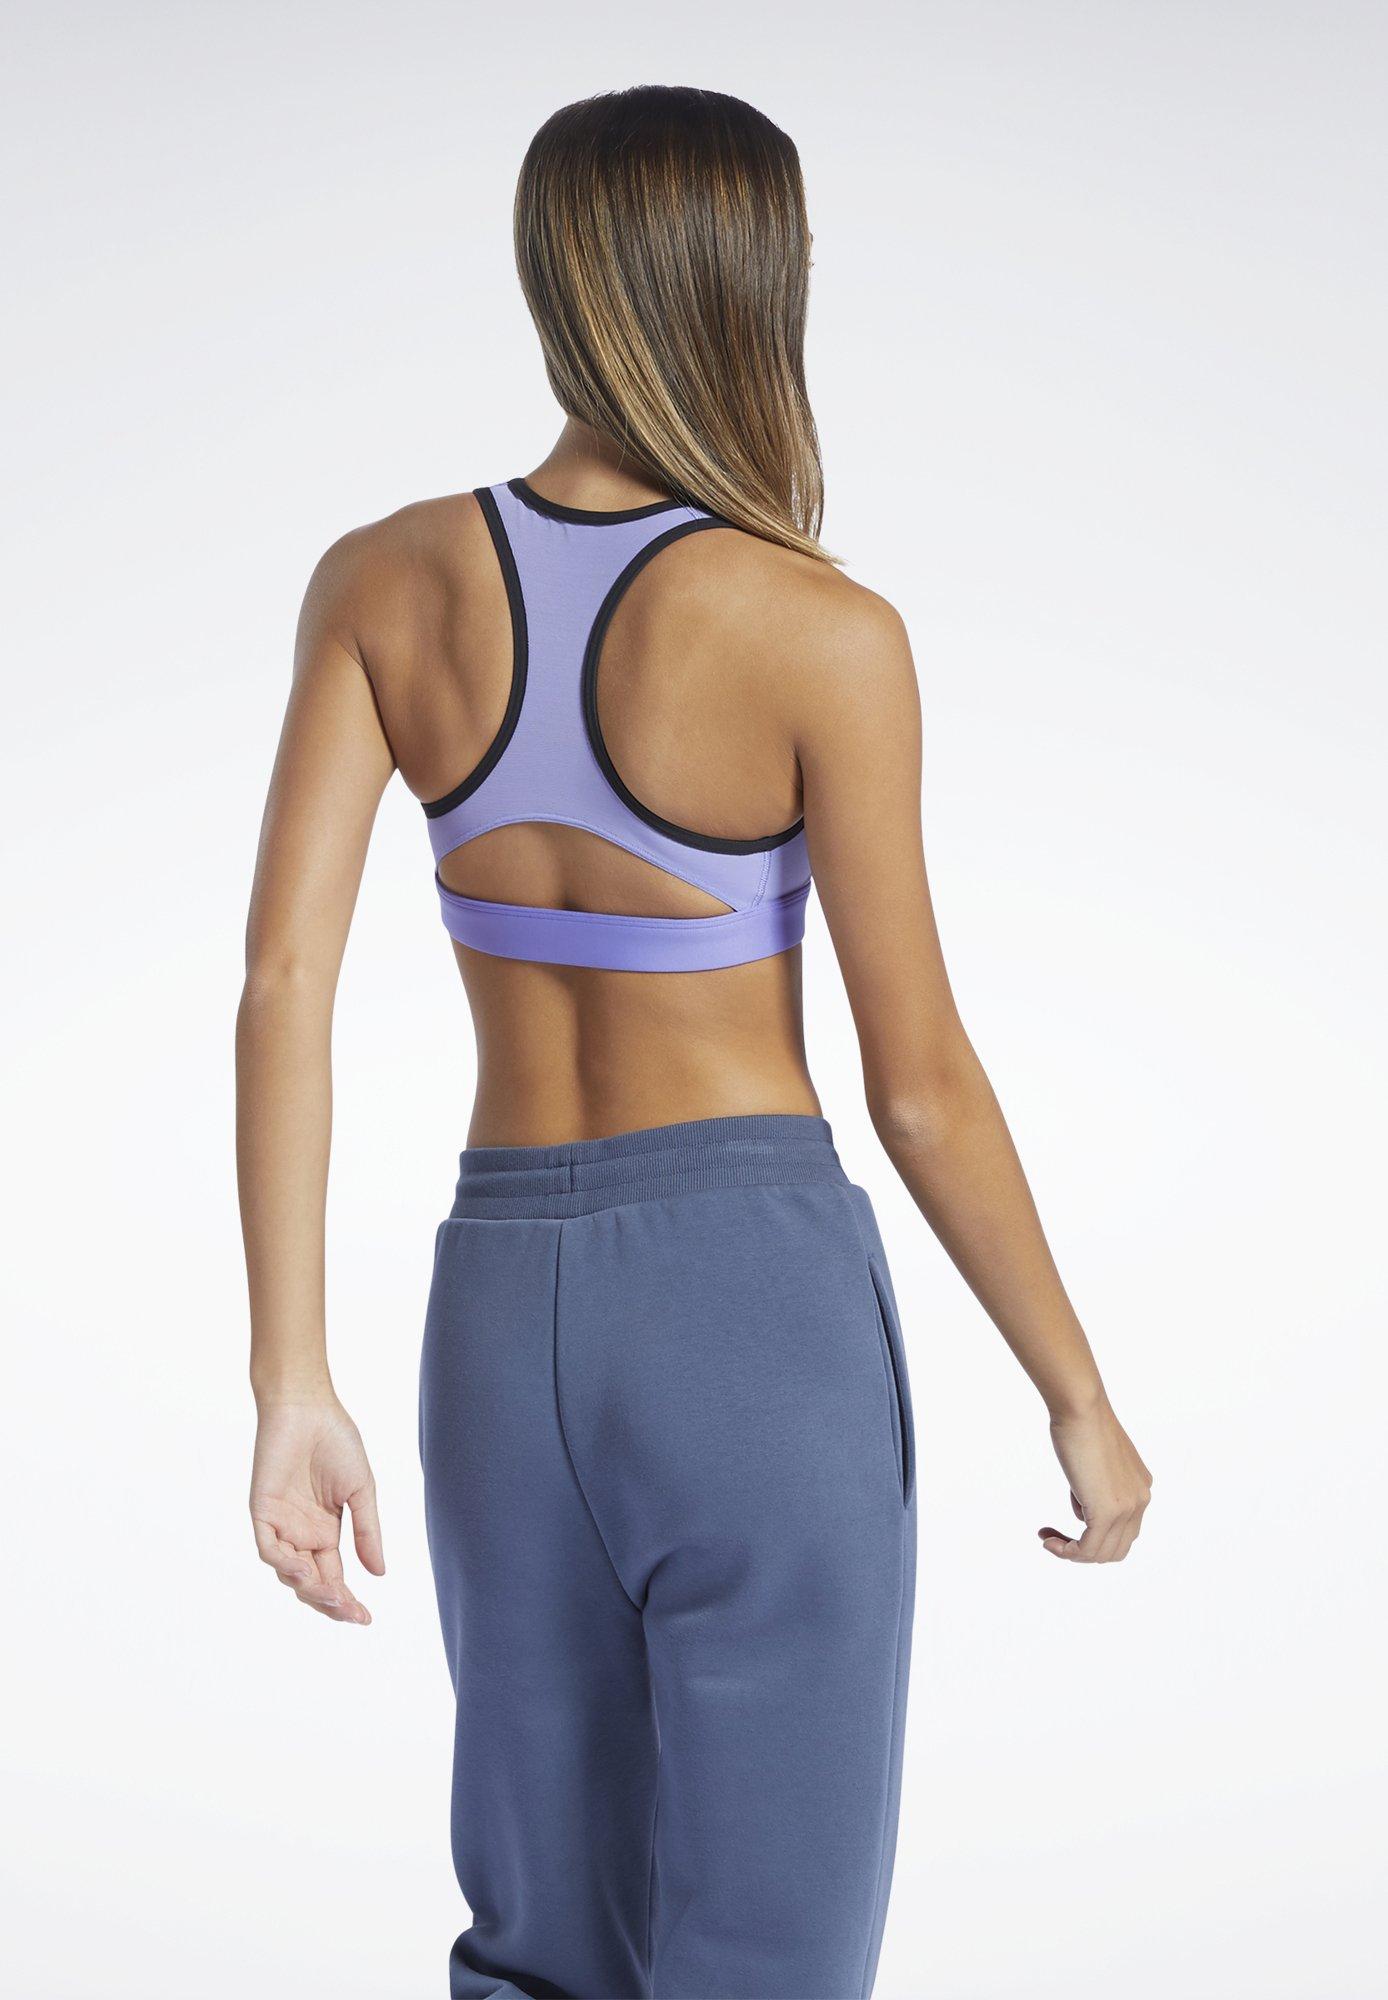 Women REEBOK LUX RACER MEDIUM-IMPACT SPORTS BRA - Medium support sports bra